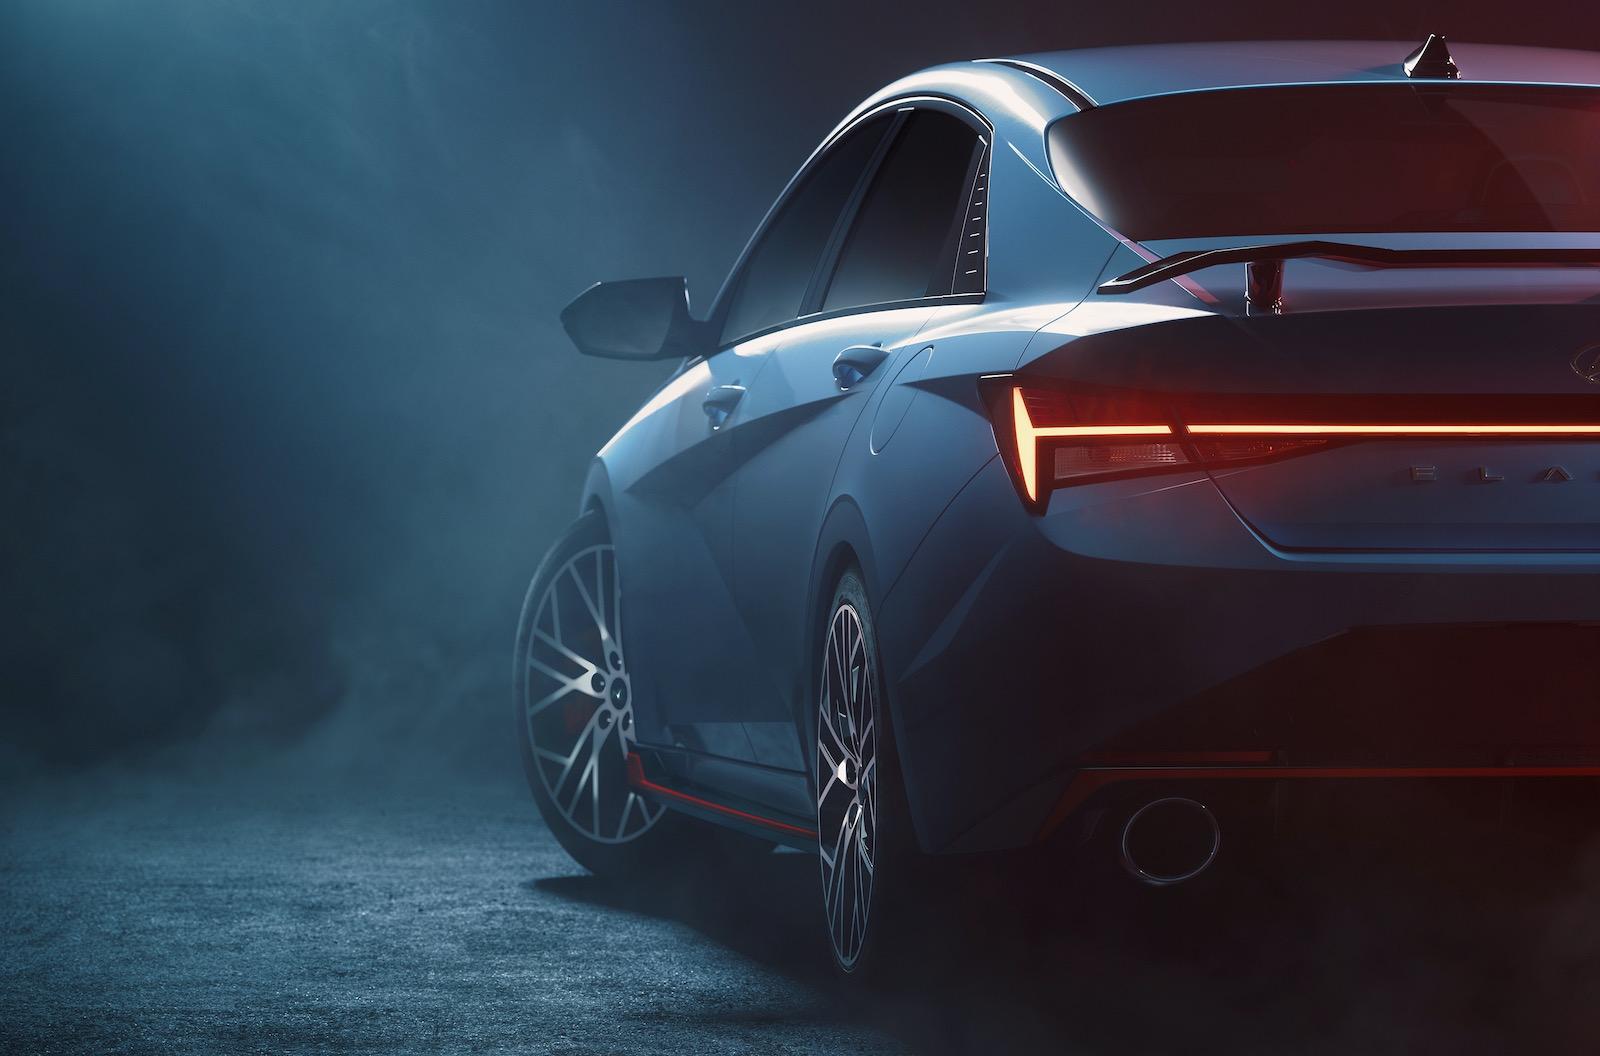 2022 Hyundai i30 Sedan N (Elantra N) previewed, spy shot reveals all